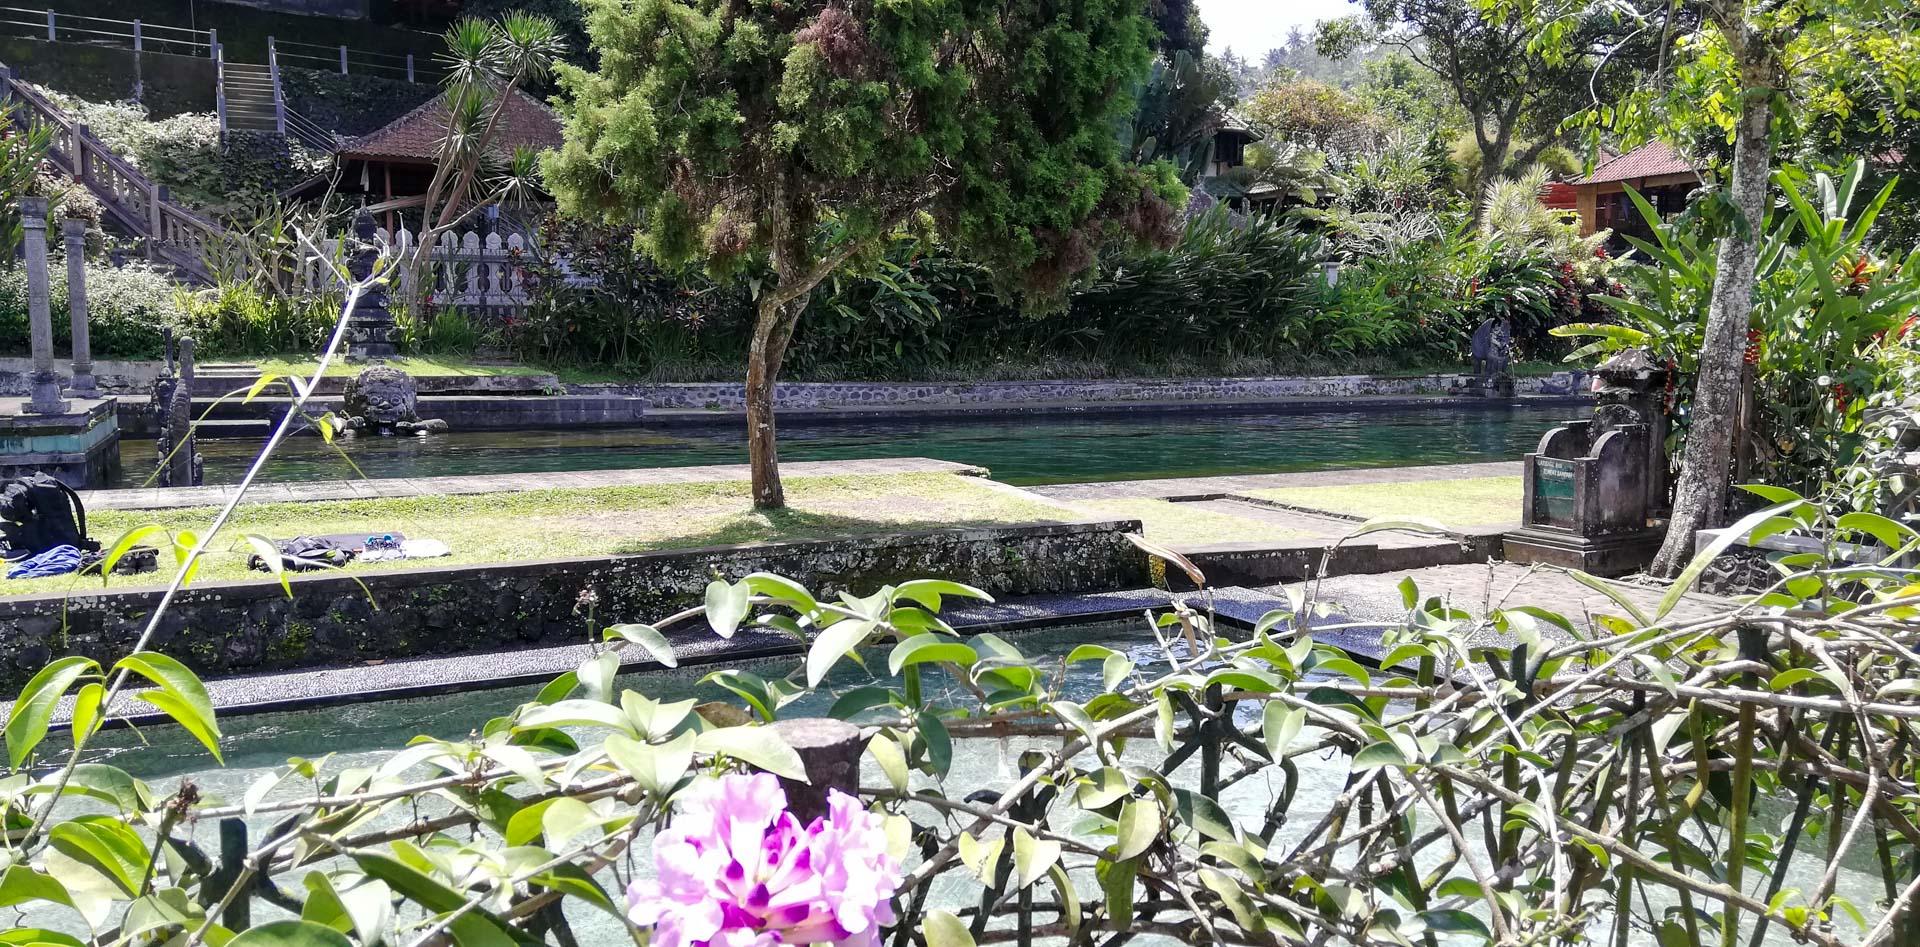 Piscinas aptas para el baño, Tirta Gangga, Bali, Indonesia